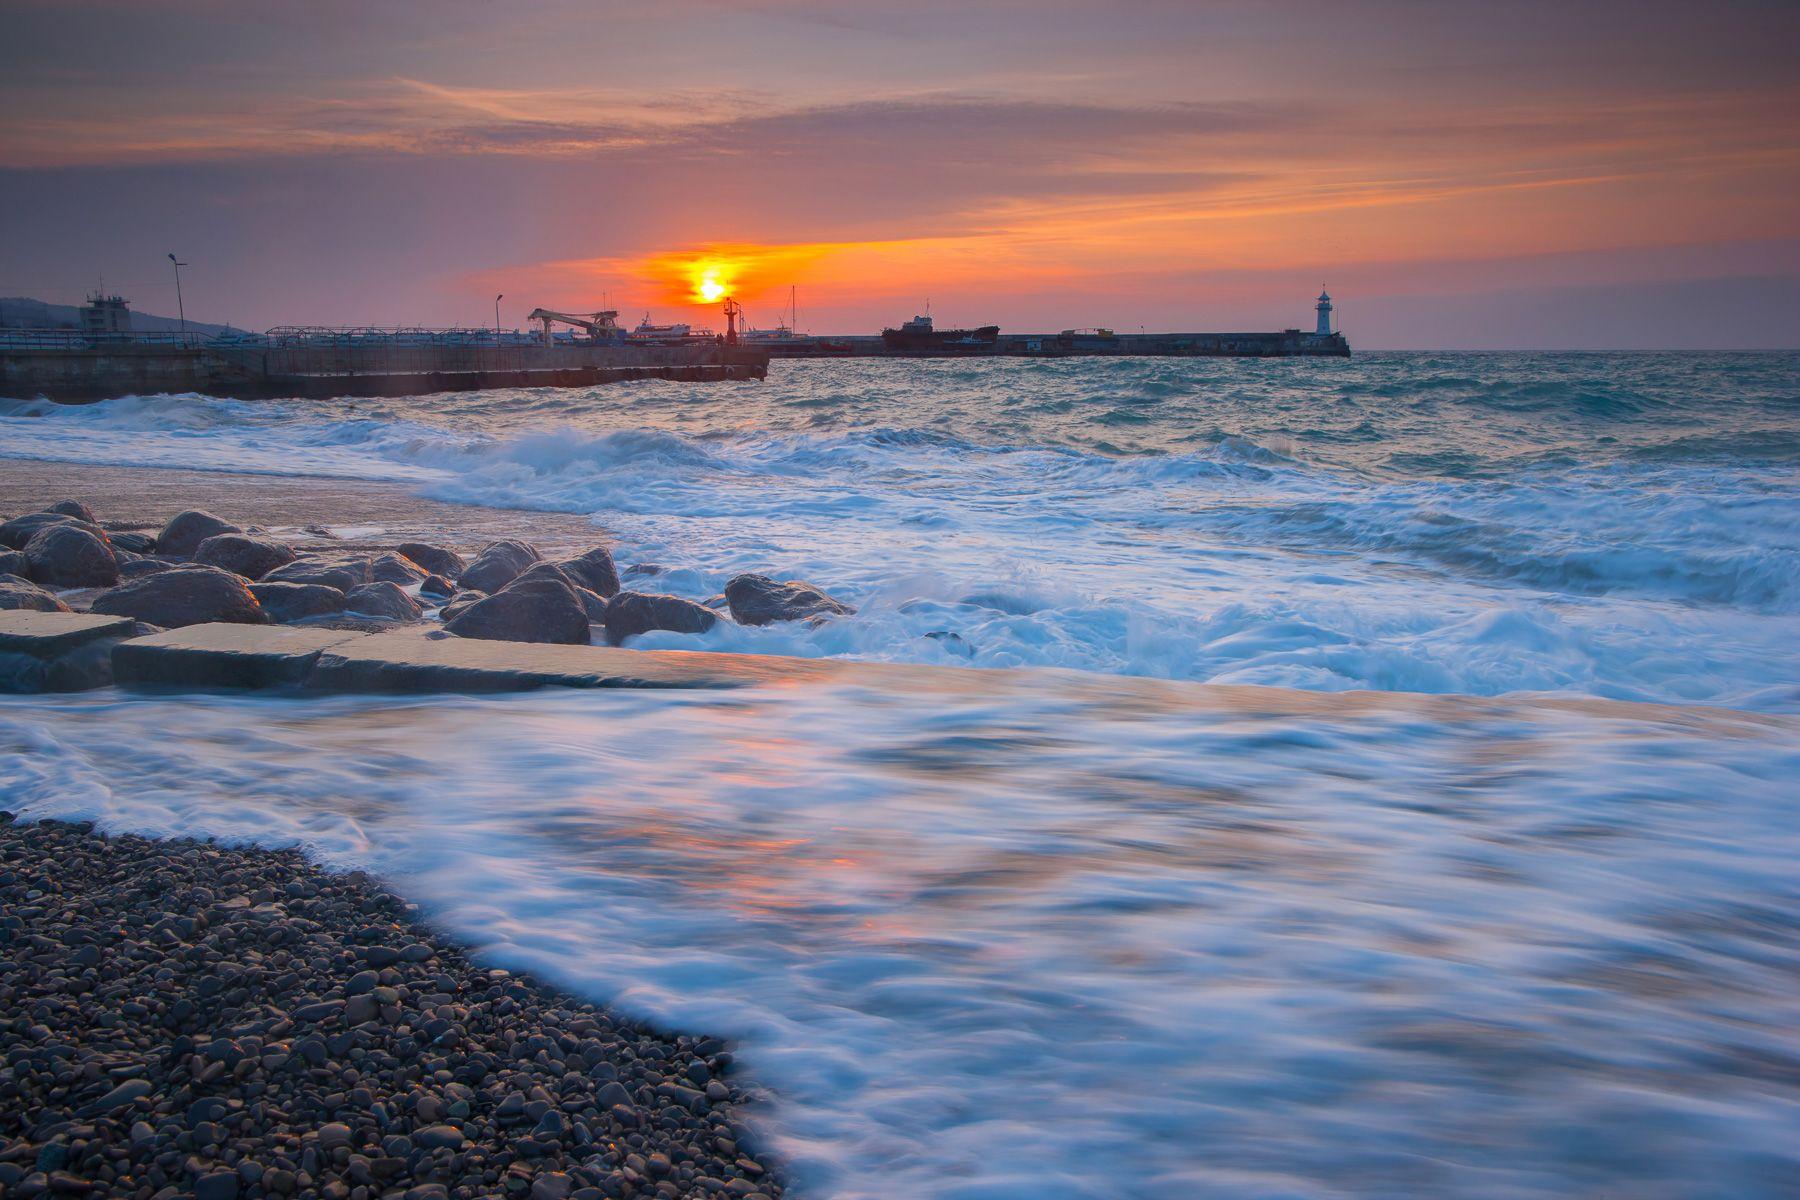 ялтинский маяк, крым, ялта, черное море, маяк, навигация, ялтинский залив, ялта порт, мартьян, мыс мартьян, Titov Serge